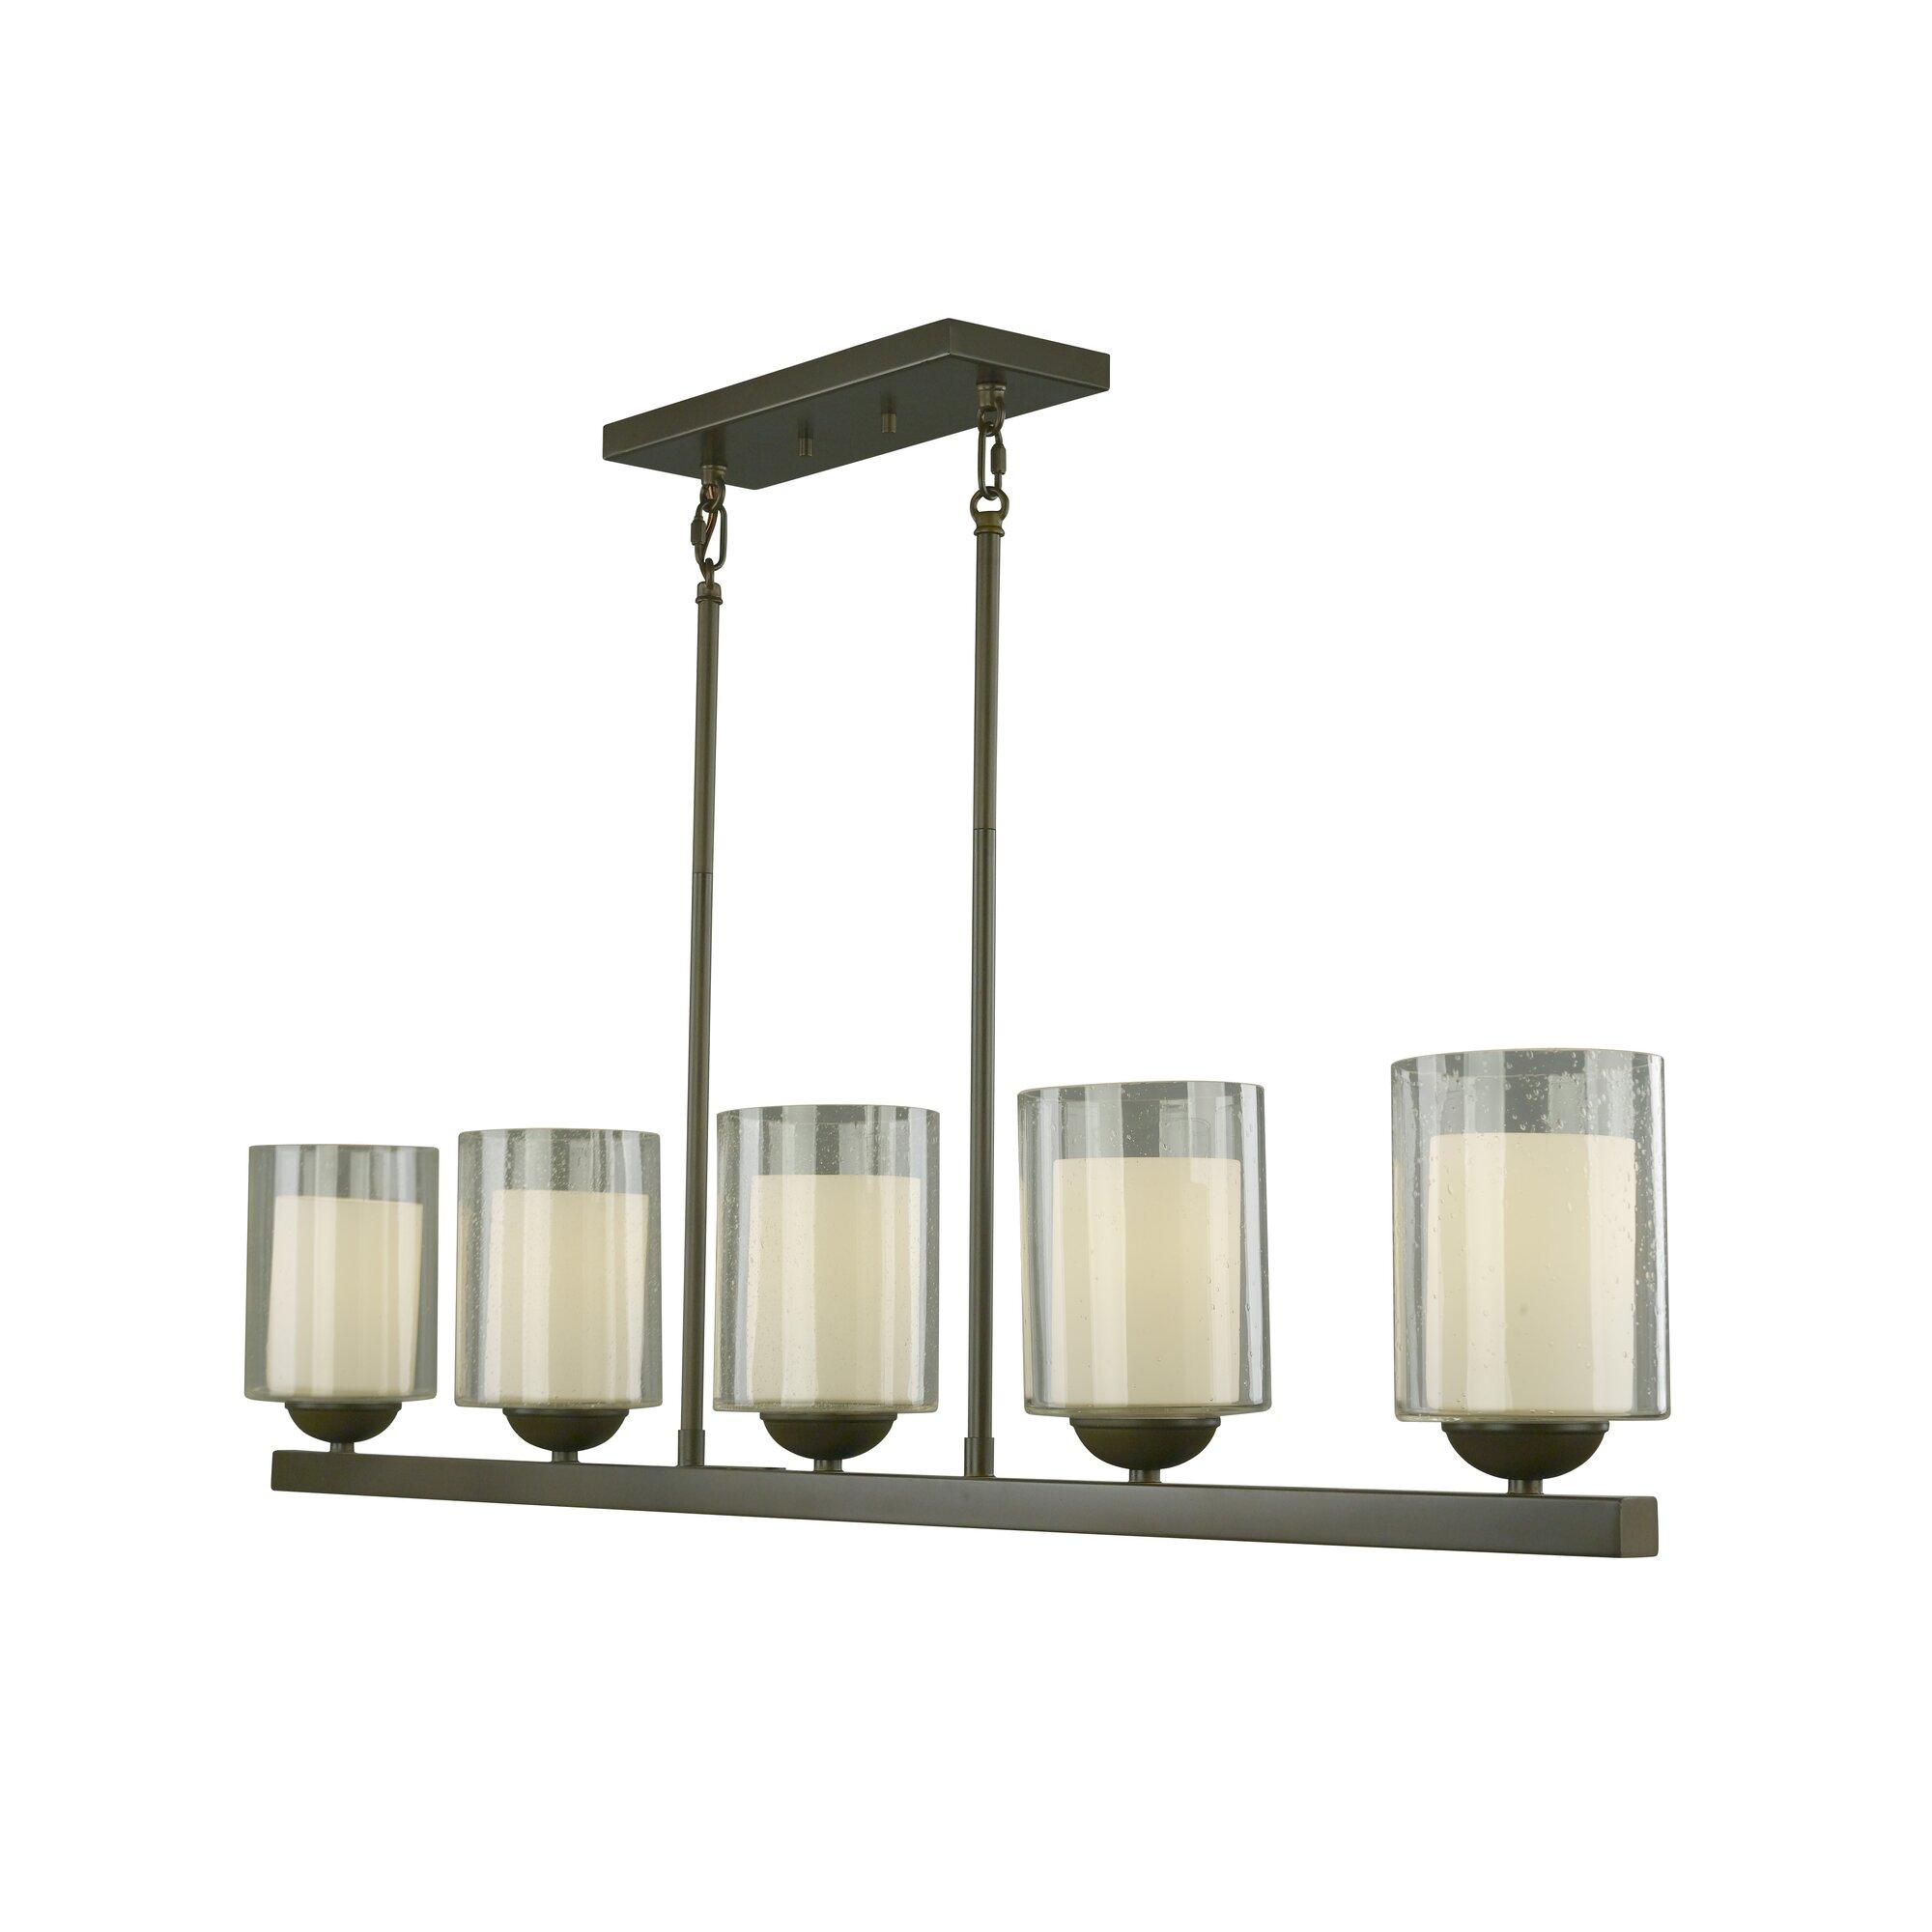 Woodbridge Cosmo 5-Light Kitchen Pendant Lighting